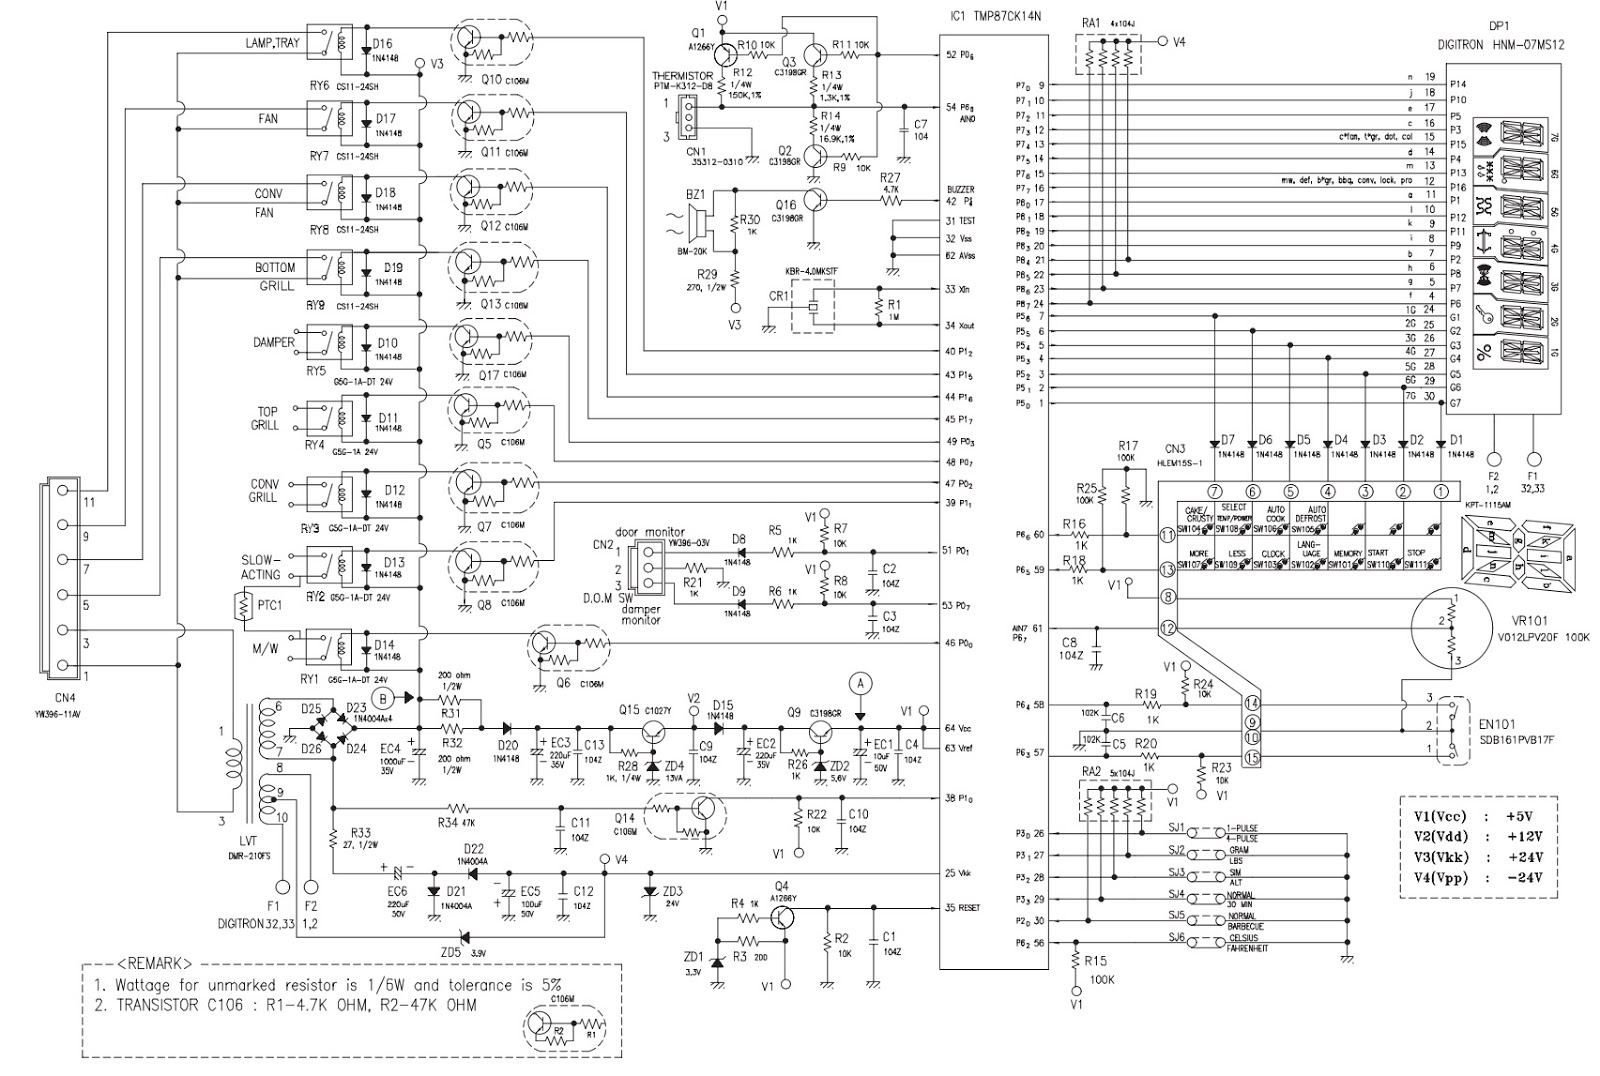 maytag microwave wiring diagram basic electronics wiring diagram maytag oven wiring diagram wrg 1374 maytag [ 1600 x 1076 Pixel ]